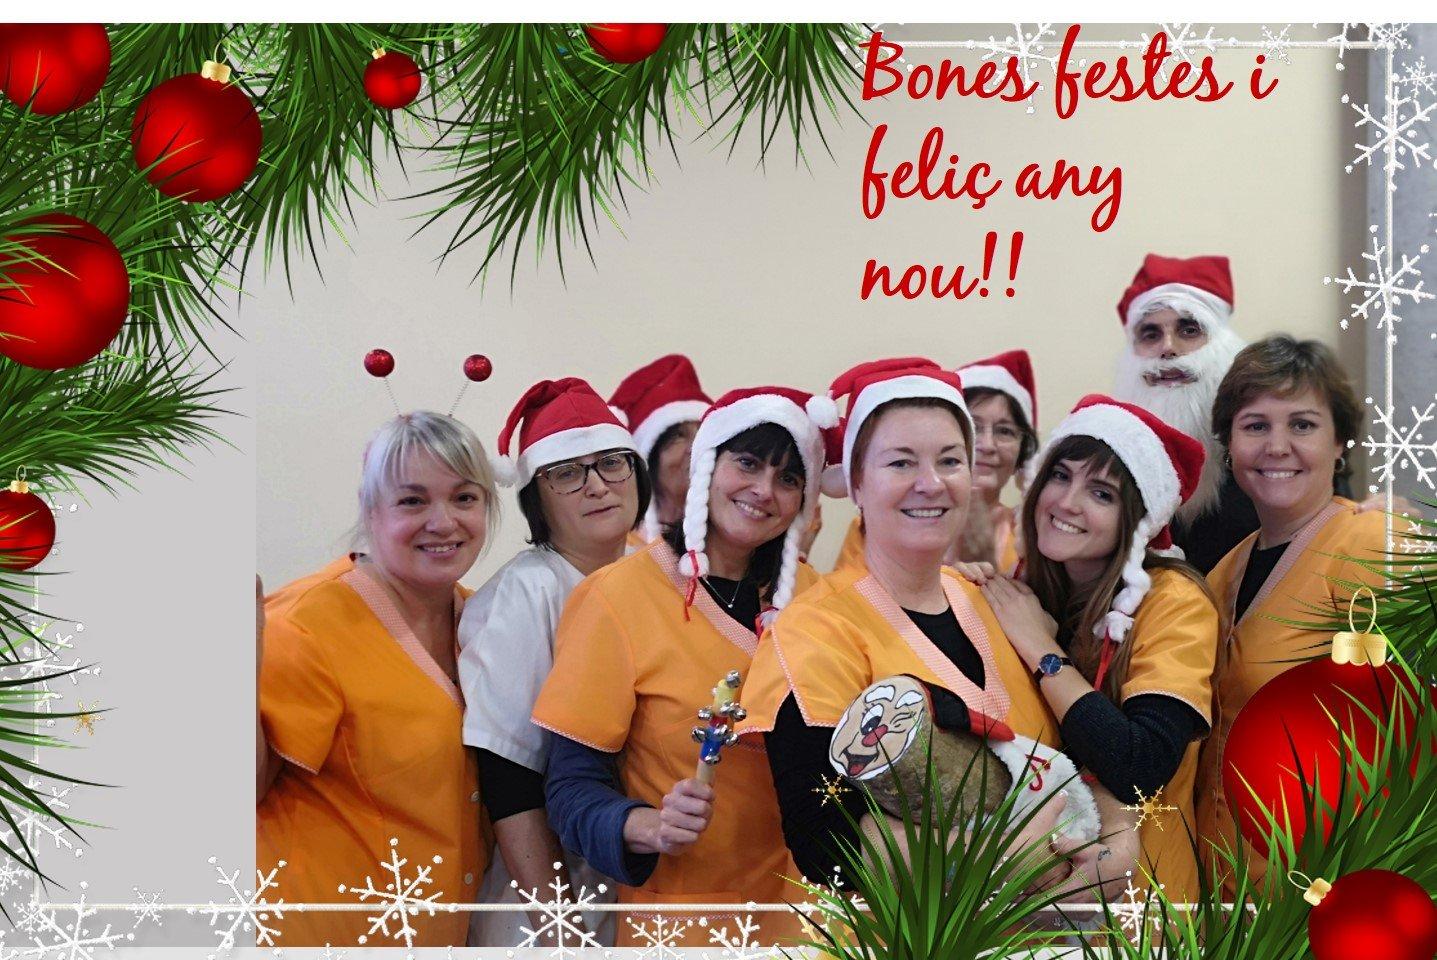 Bones Festes i Feliç Any Nou!!